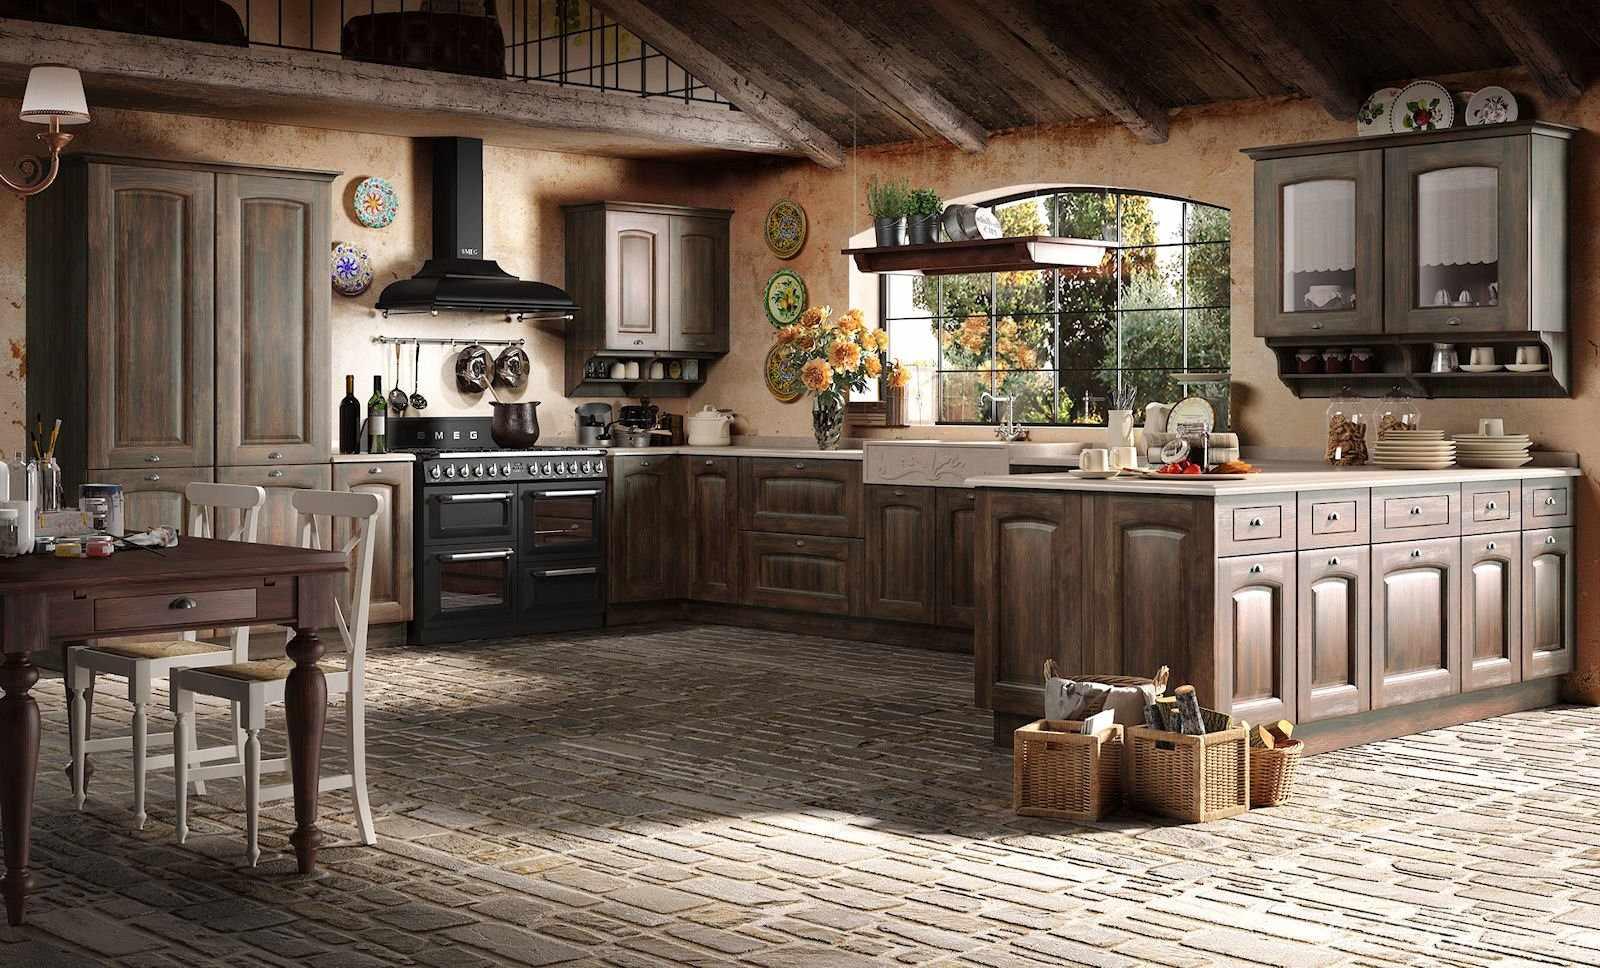 Мебель из дерева на кухне в стиле кантри